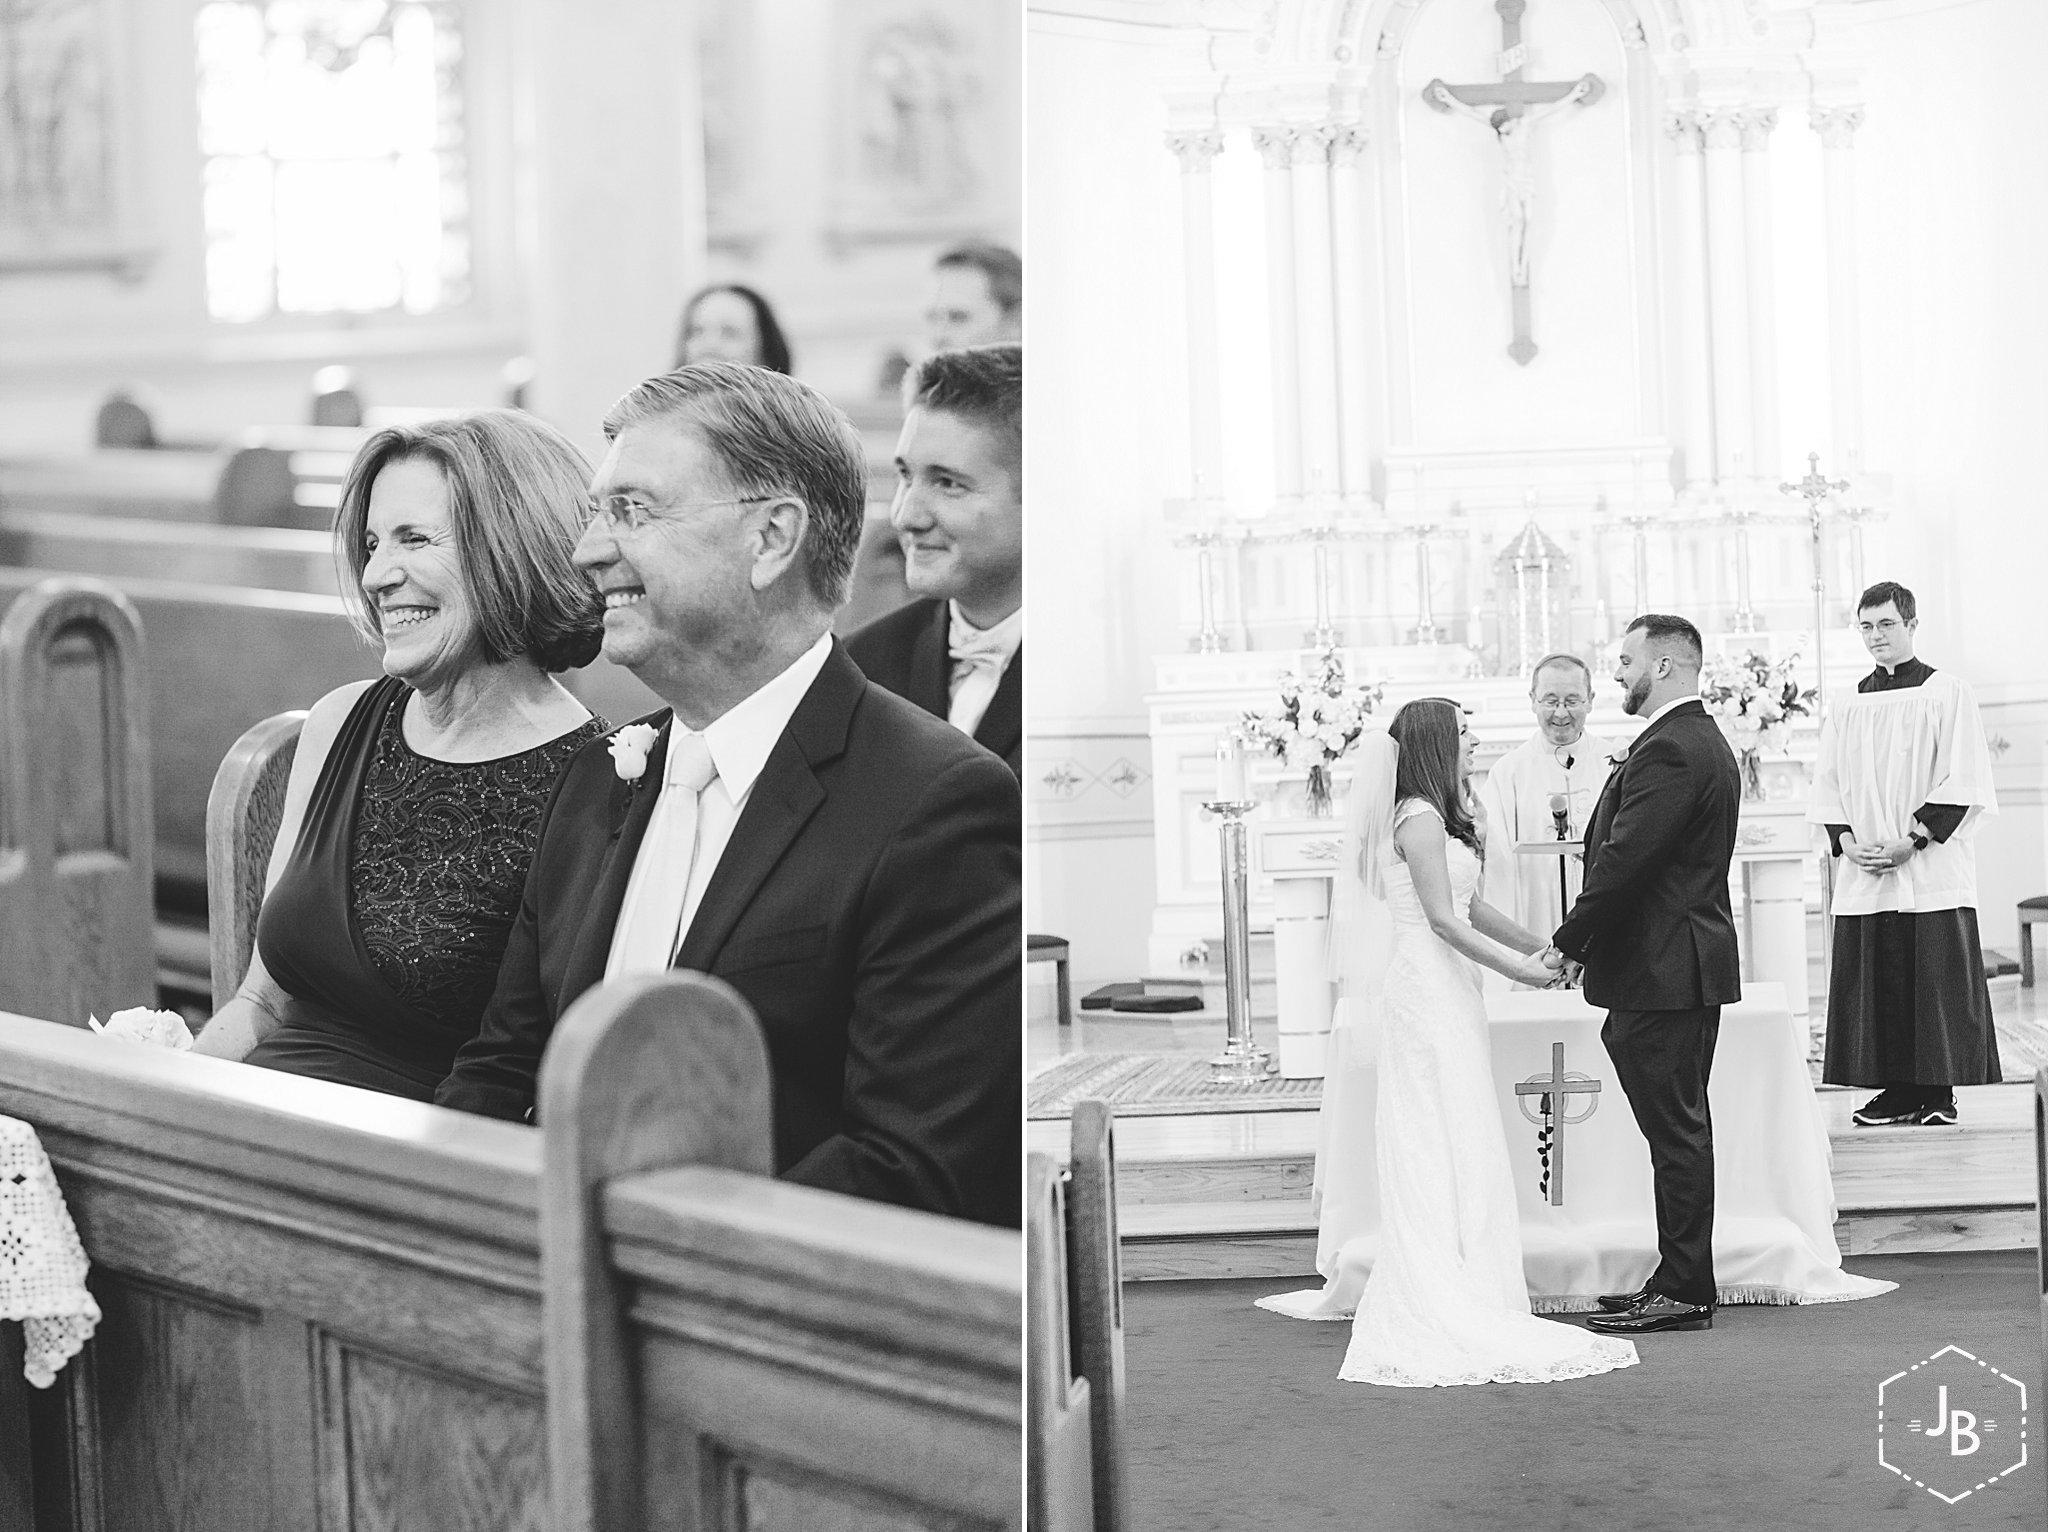 WeddingandEngagementFloridaPhotographer_2914.jpg